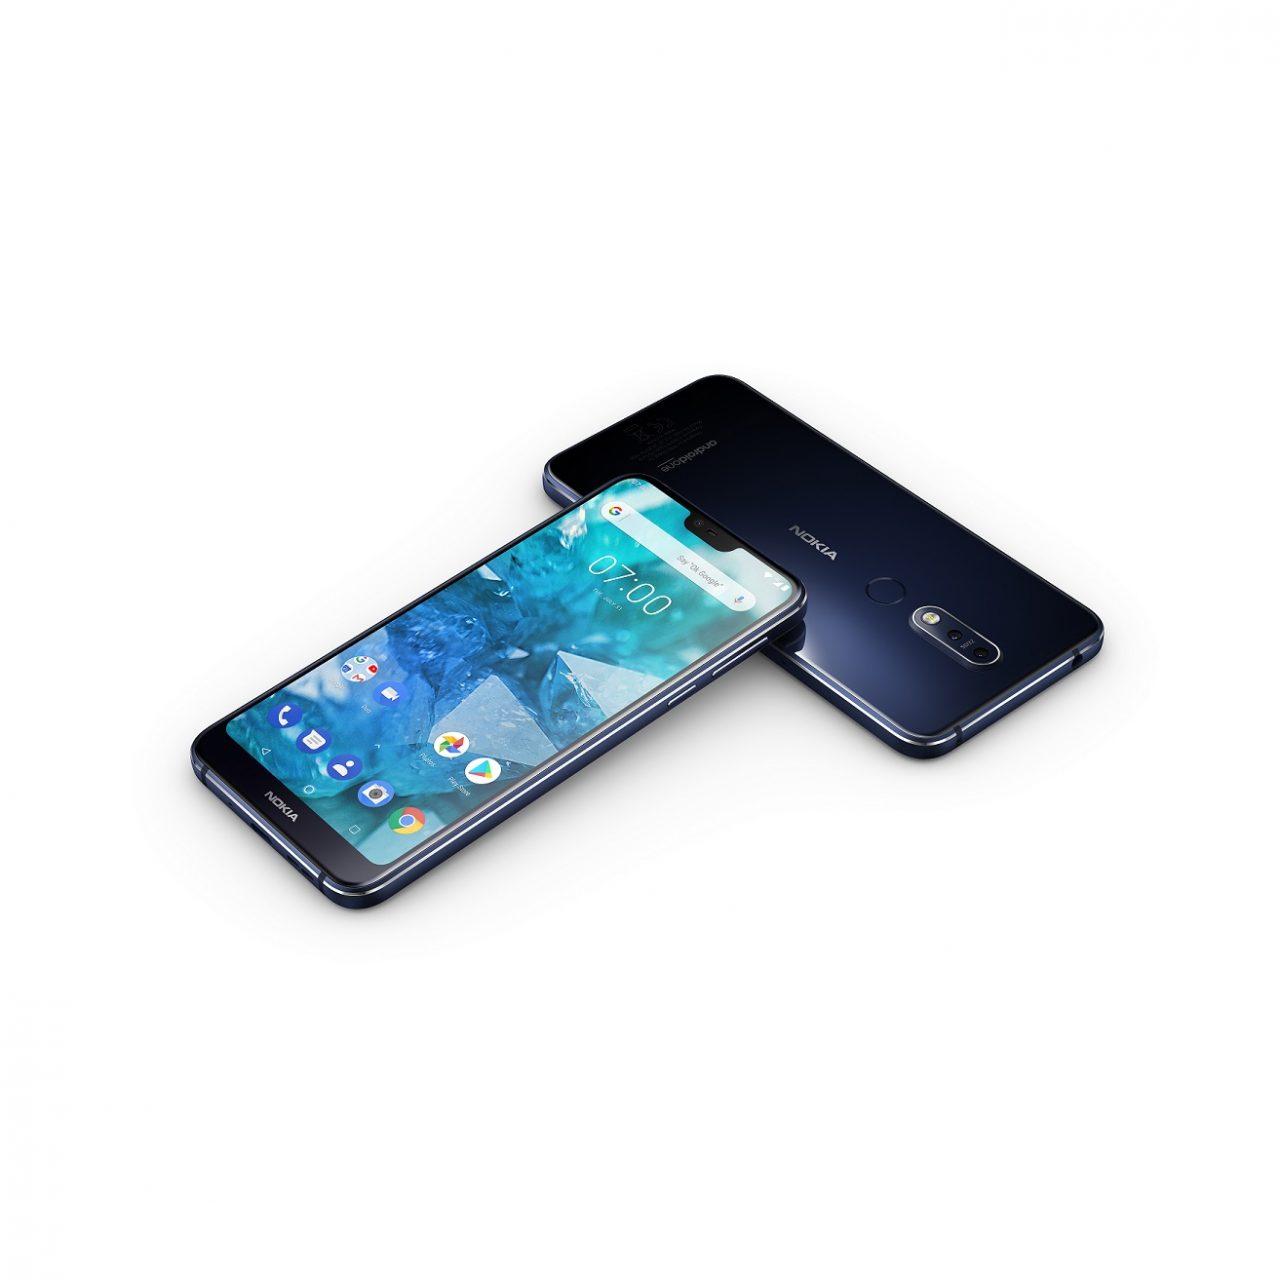 Miglior Smartphone Nokia